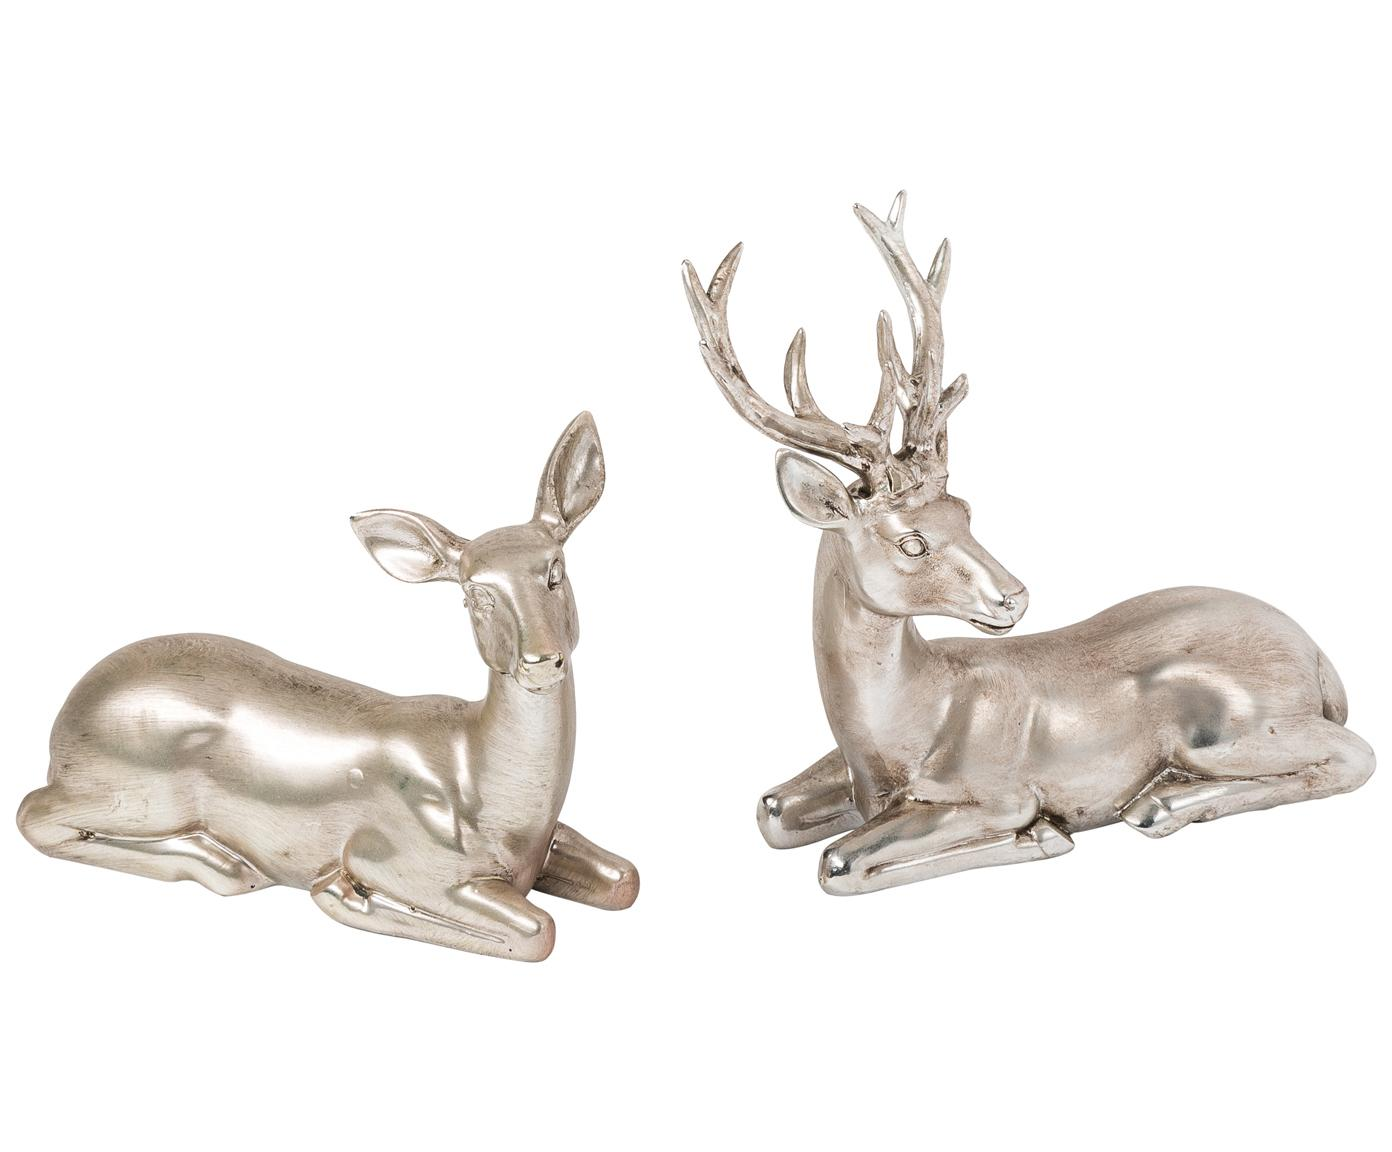 Set renne decorative Reindeer 2 pz, Resina, Argento, effetto vintage, B 15 x A 15 cm